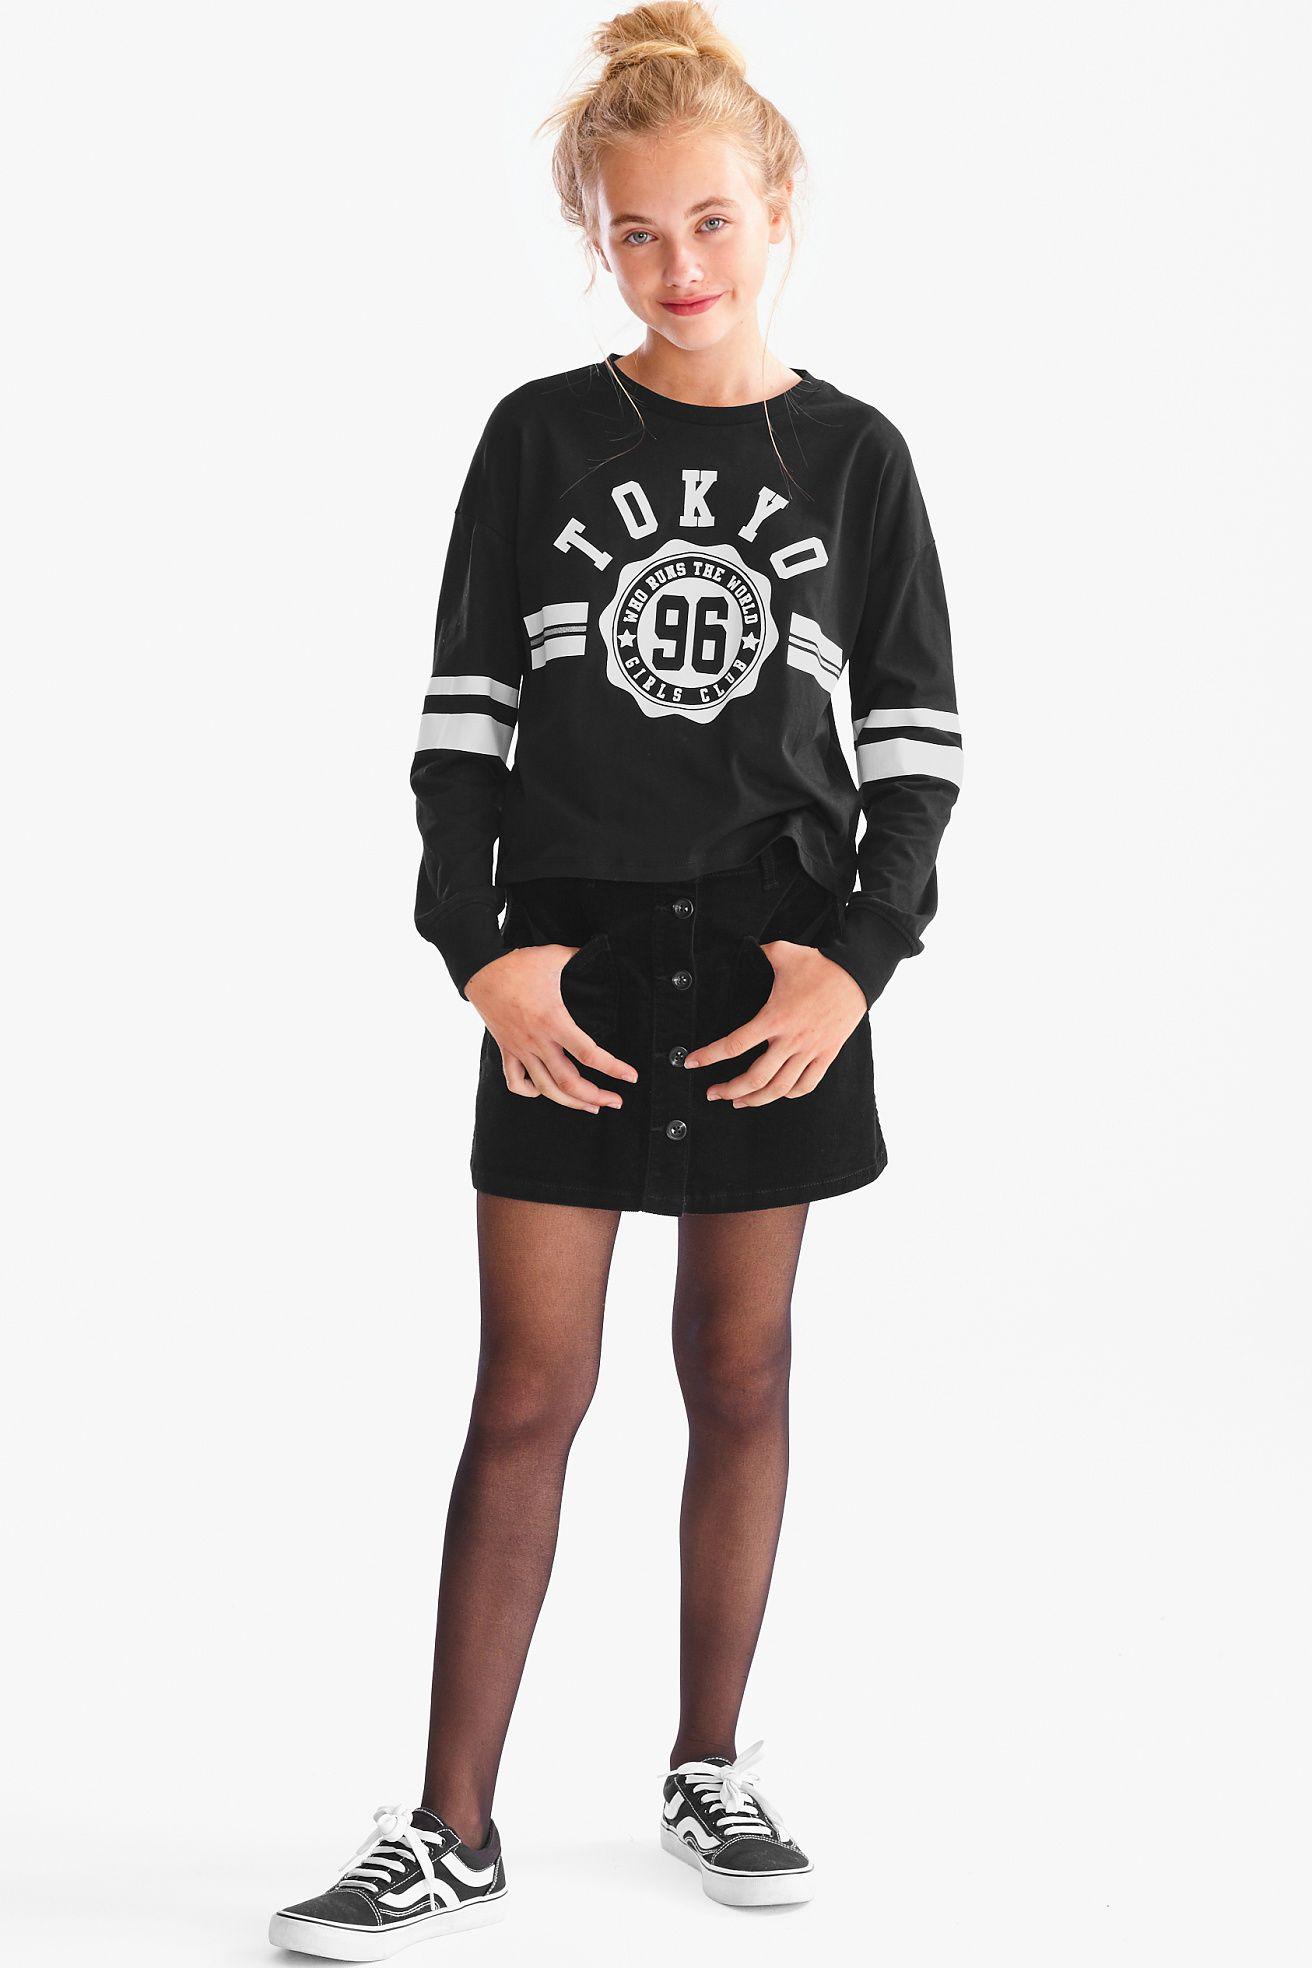 Langarmshirt Junge Madchen Mode Kleid Fur Jugendliche Kindermode Kleider